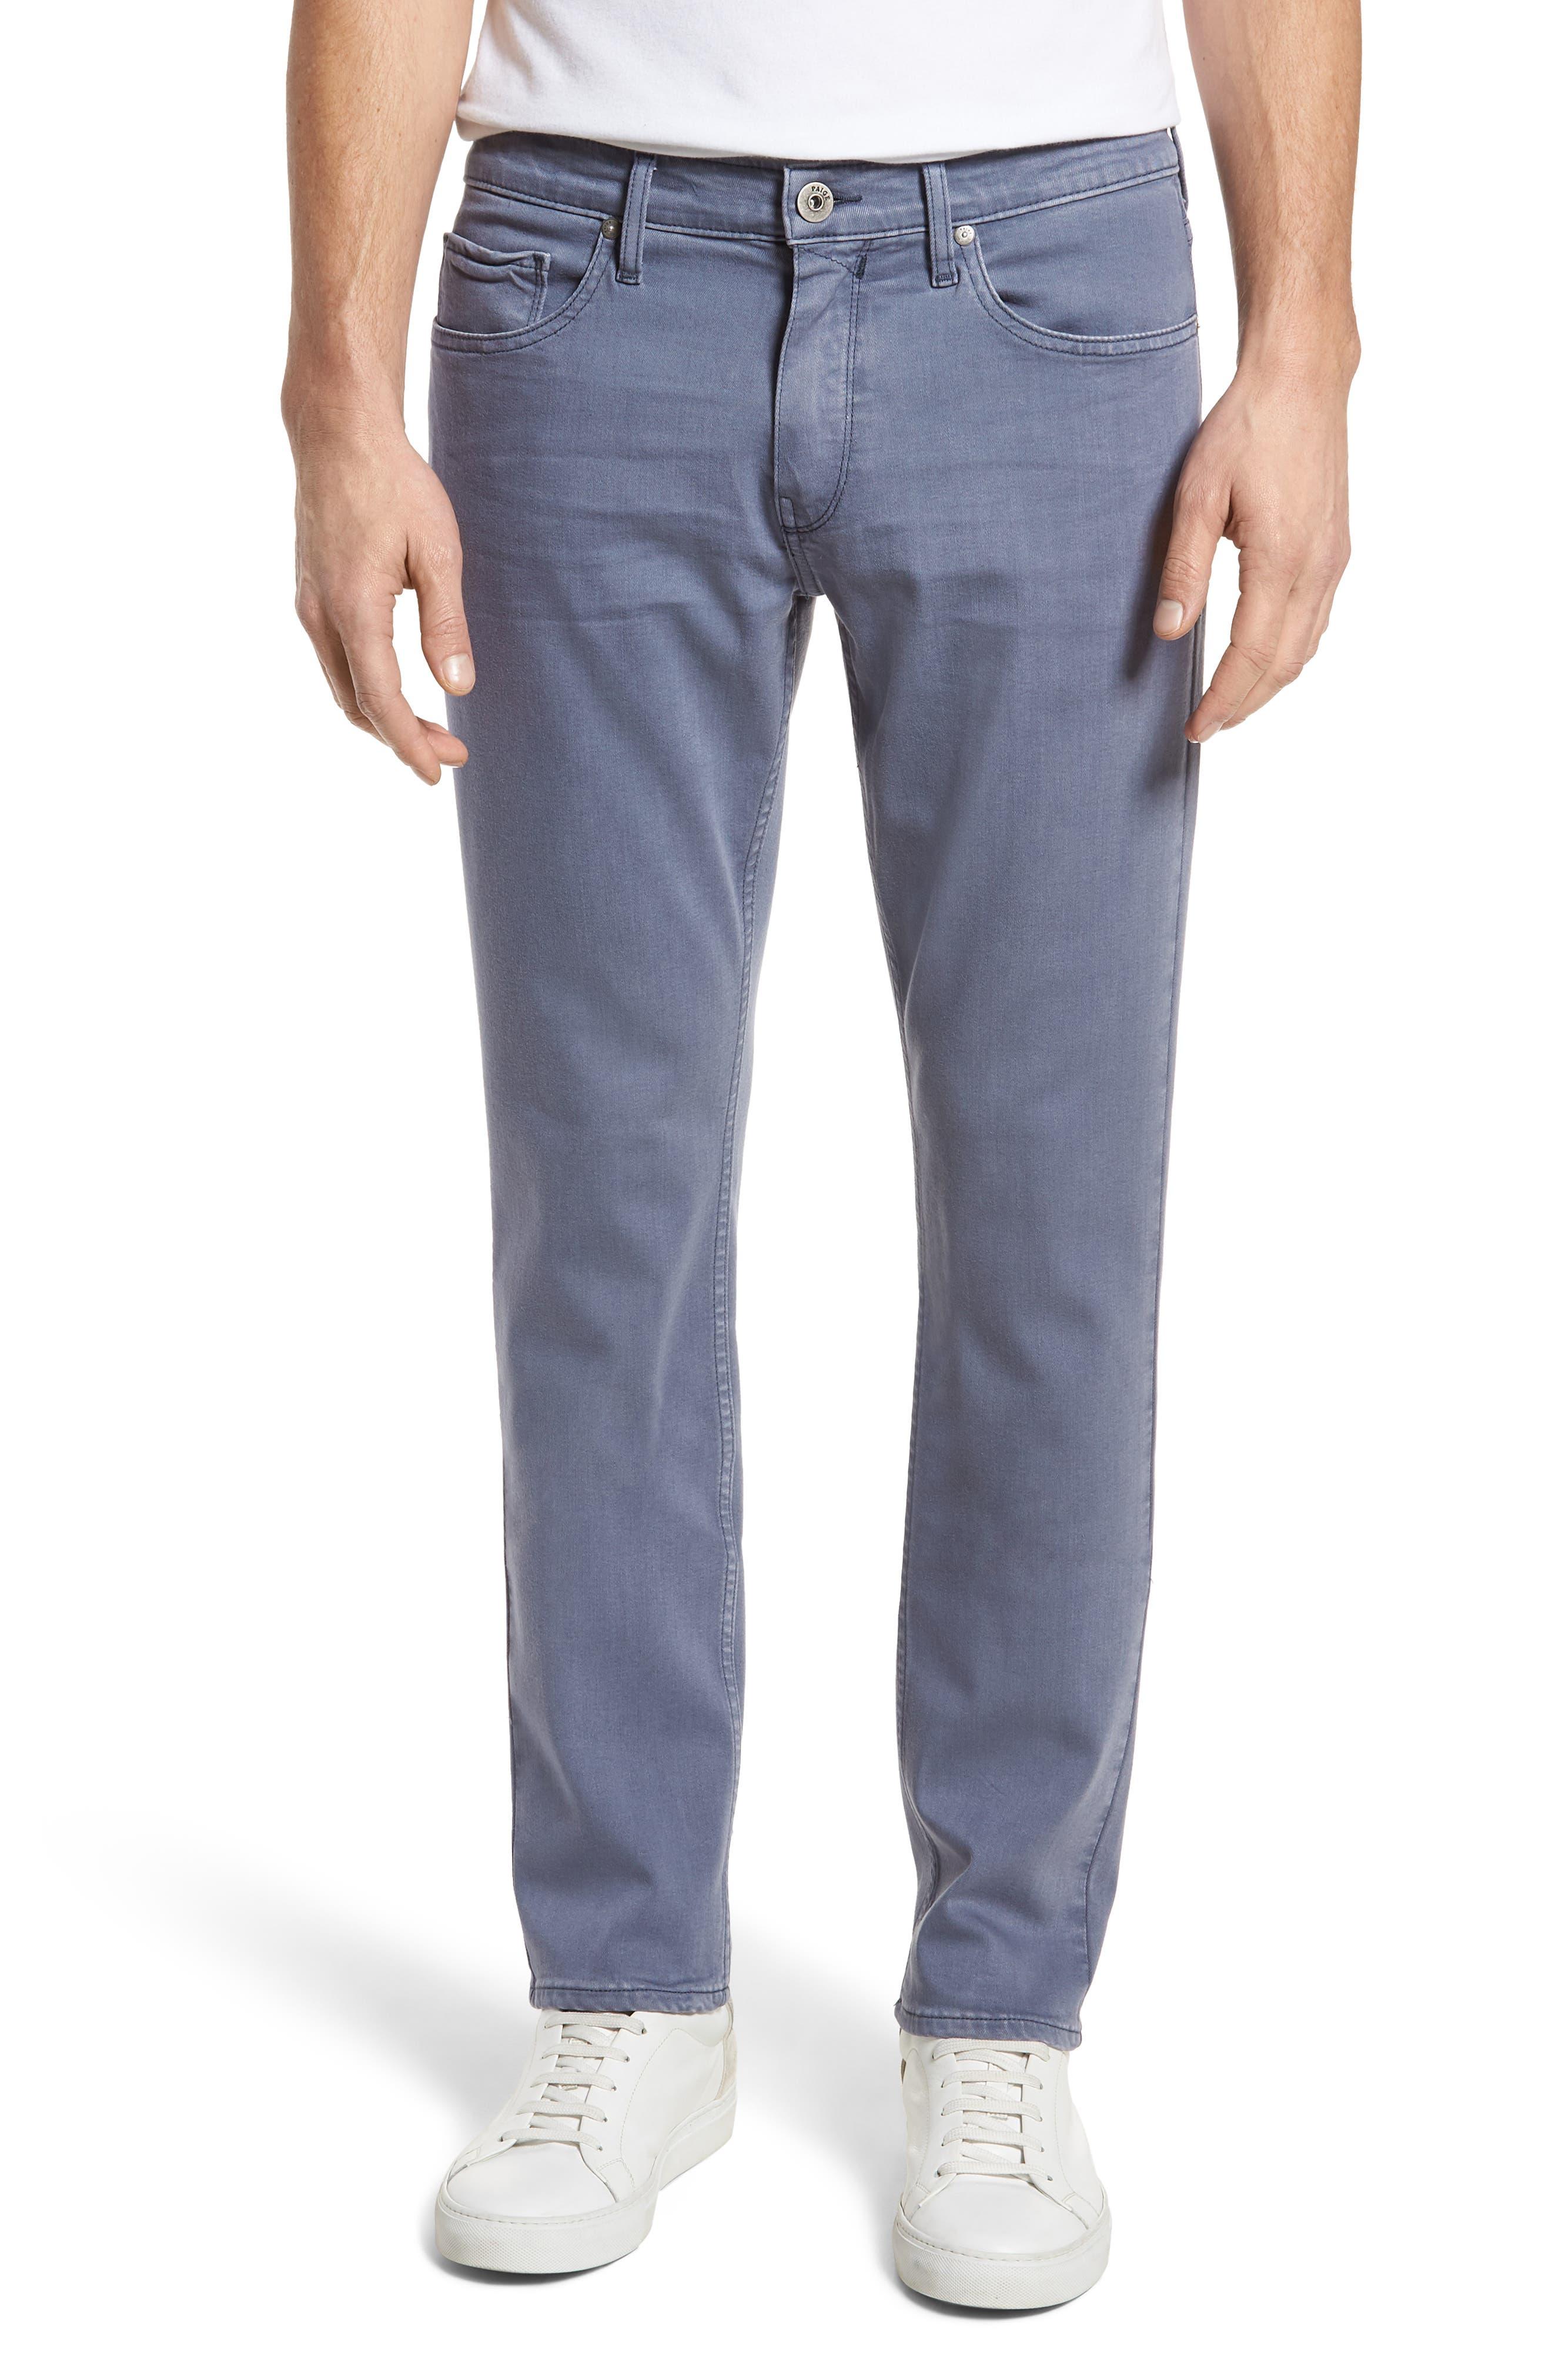 Transcend - Federal Slim Straight Leg Jeans,                             Main thumbnail 1, color,                             420